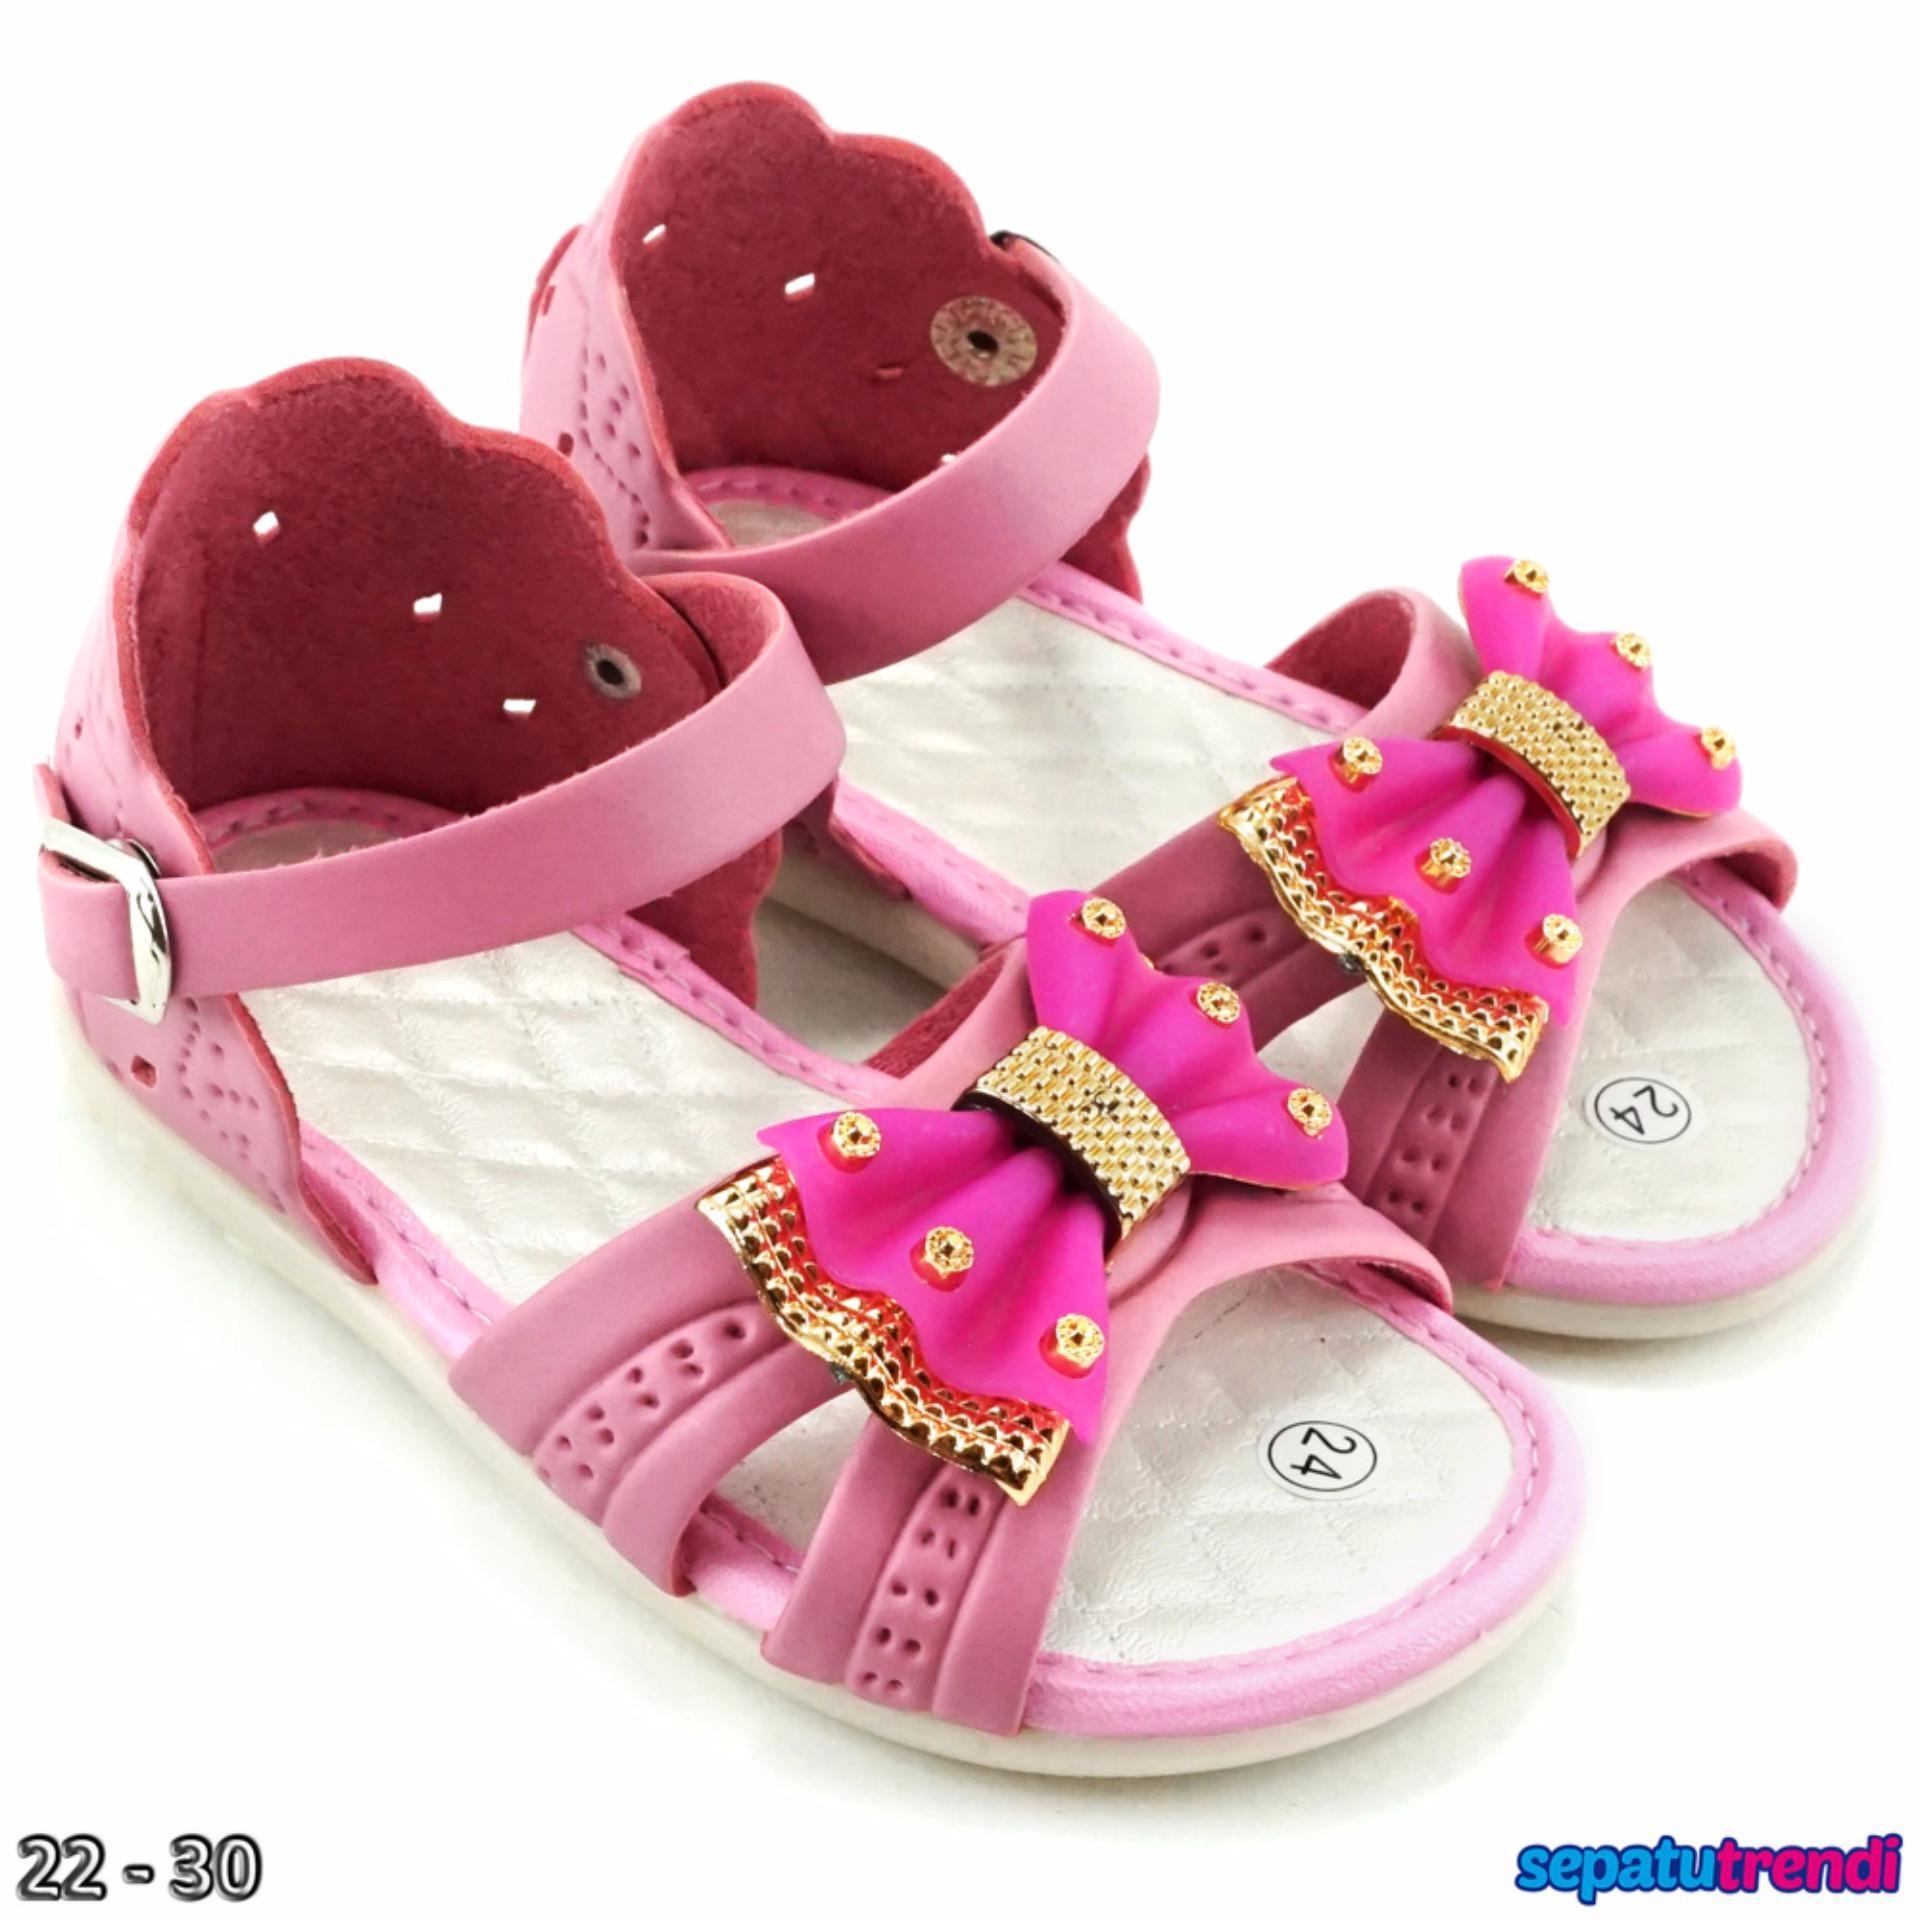 ... TrendiShoes Sandal Anak Perempuan Variasi Pita KX06 - Pink ...